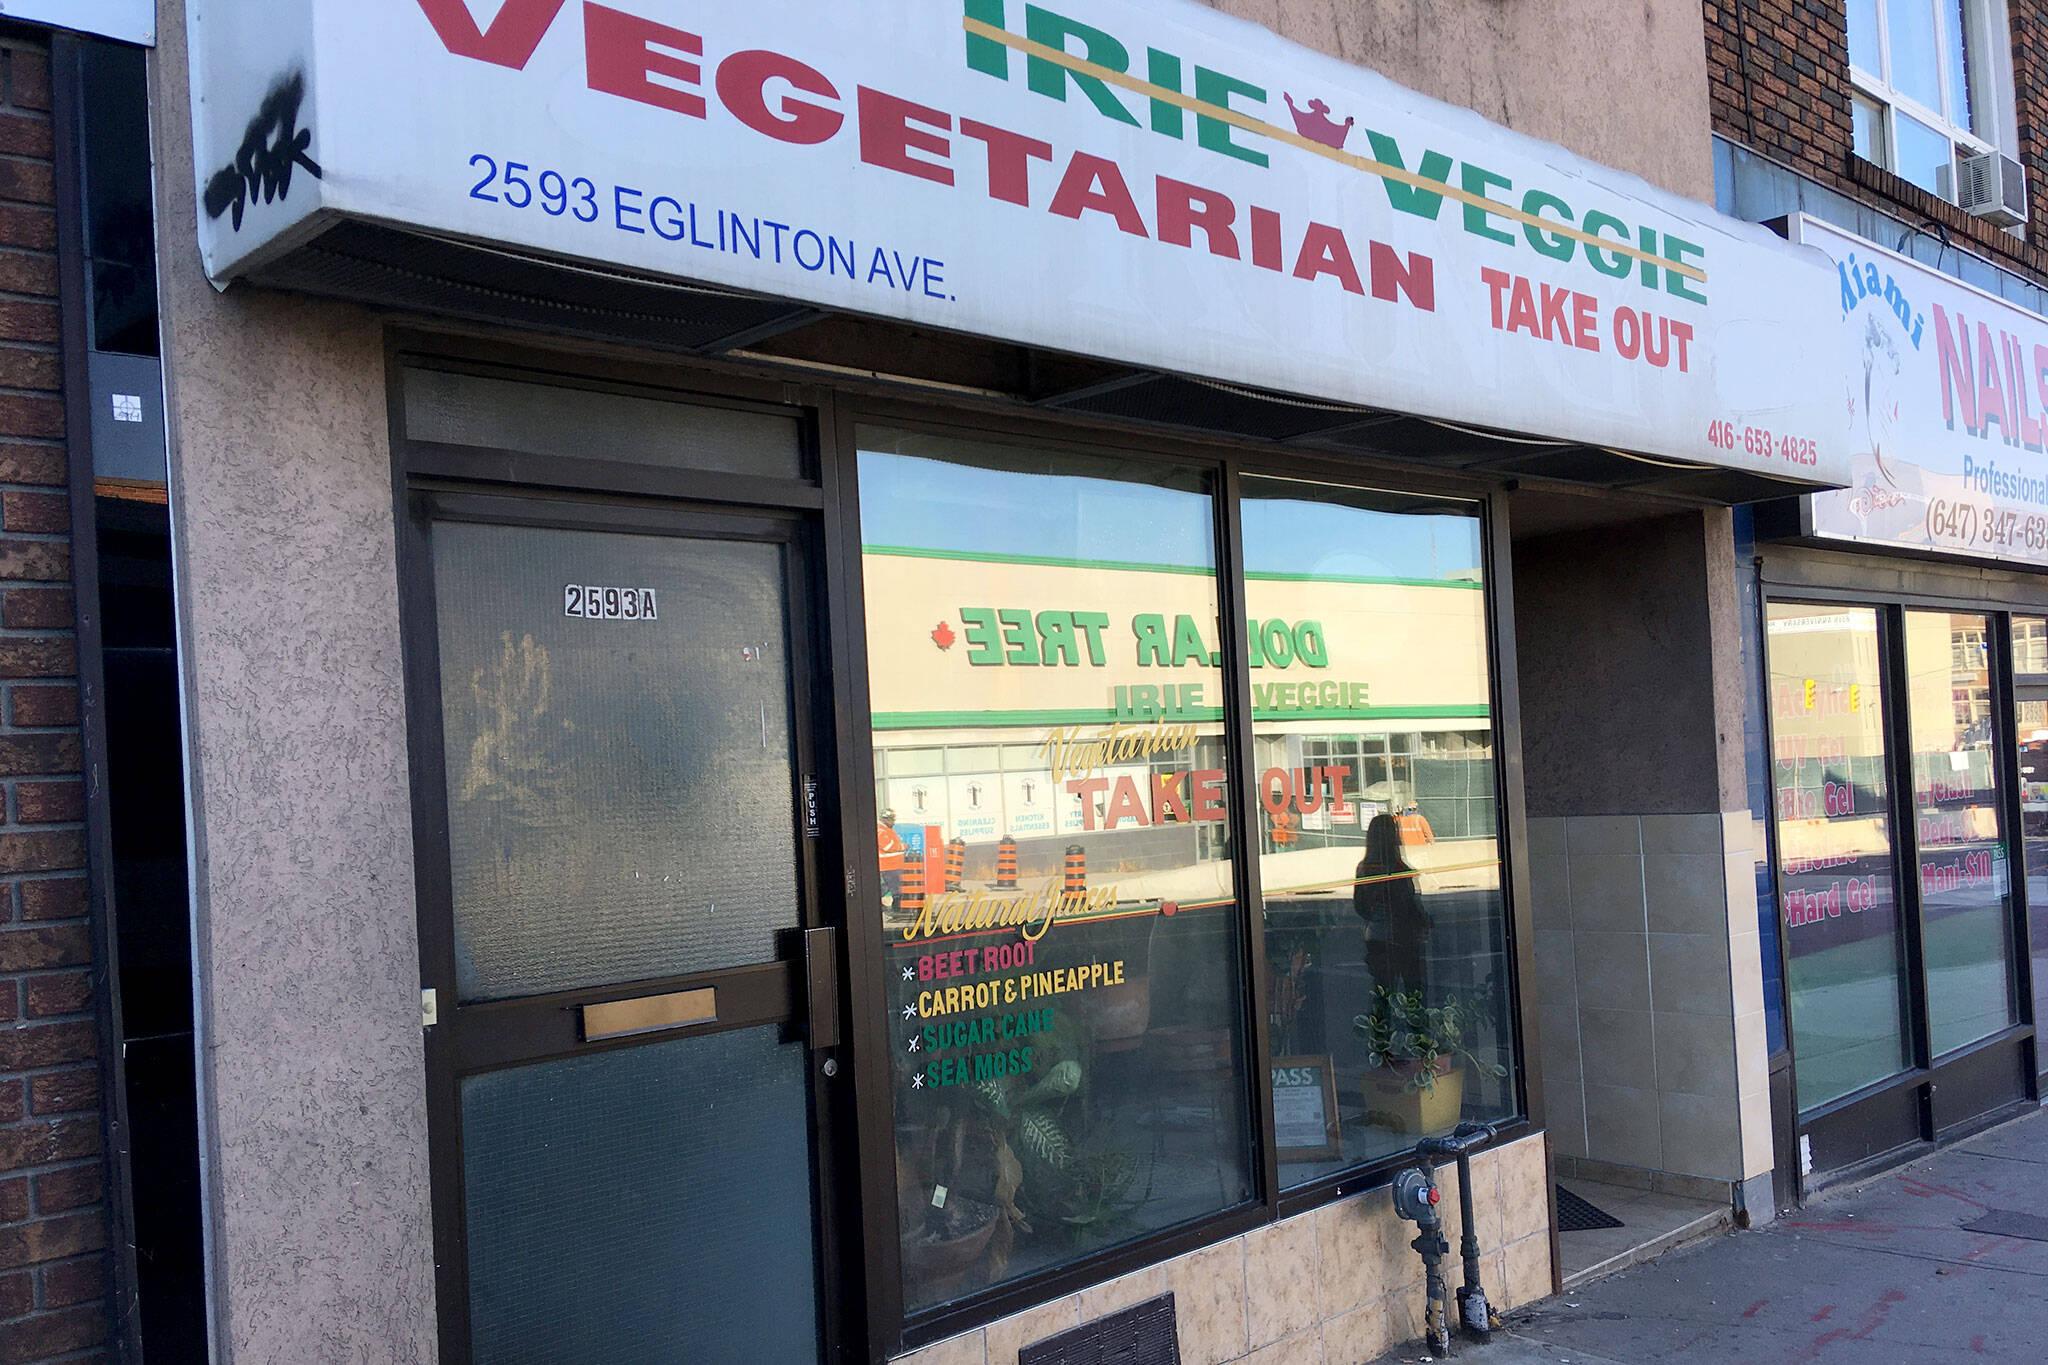 Irie Veggie Toronto